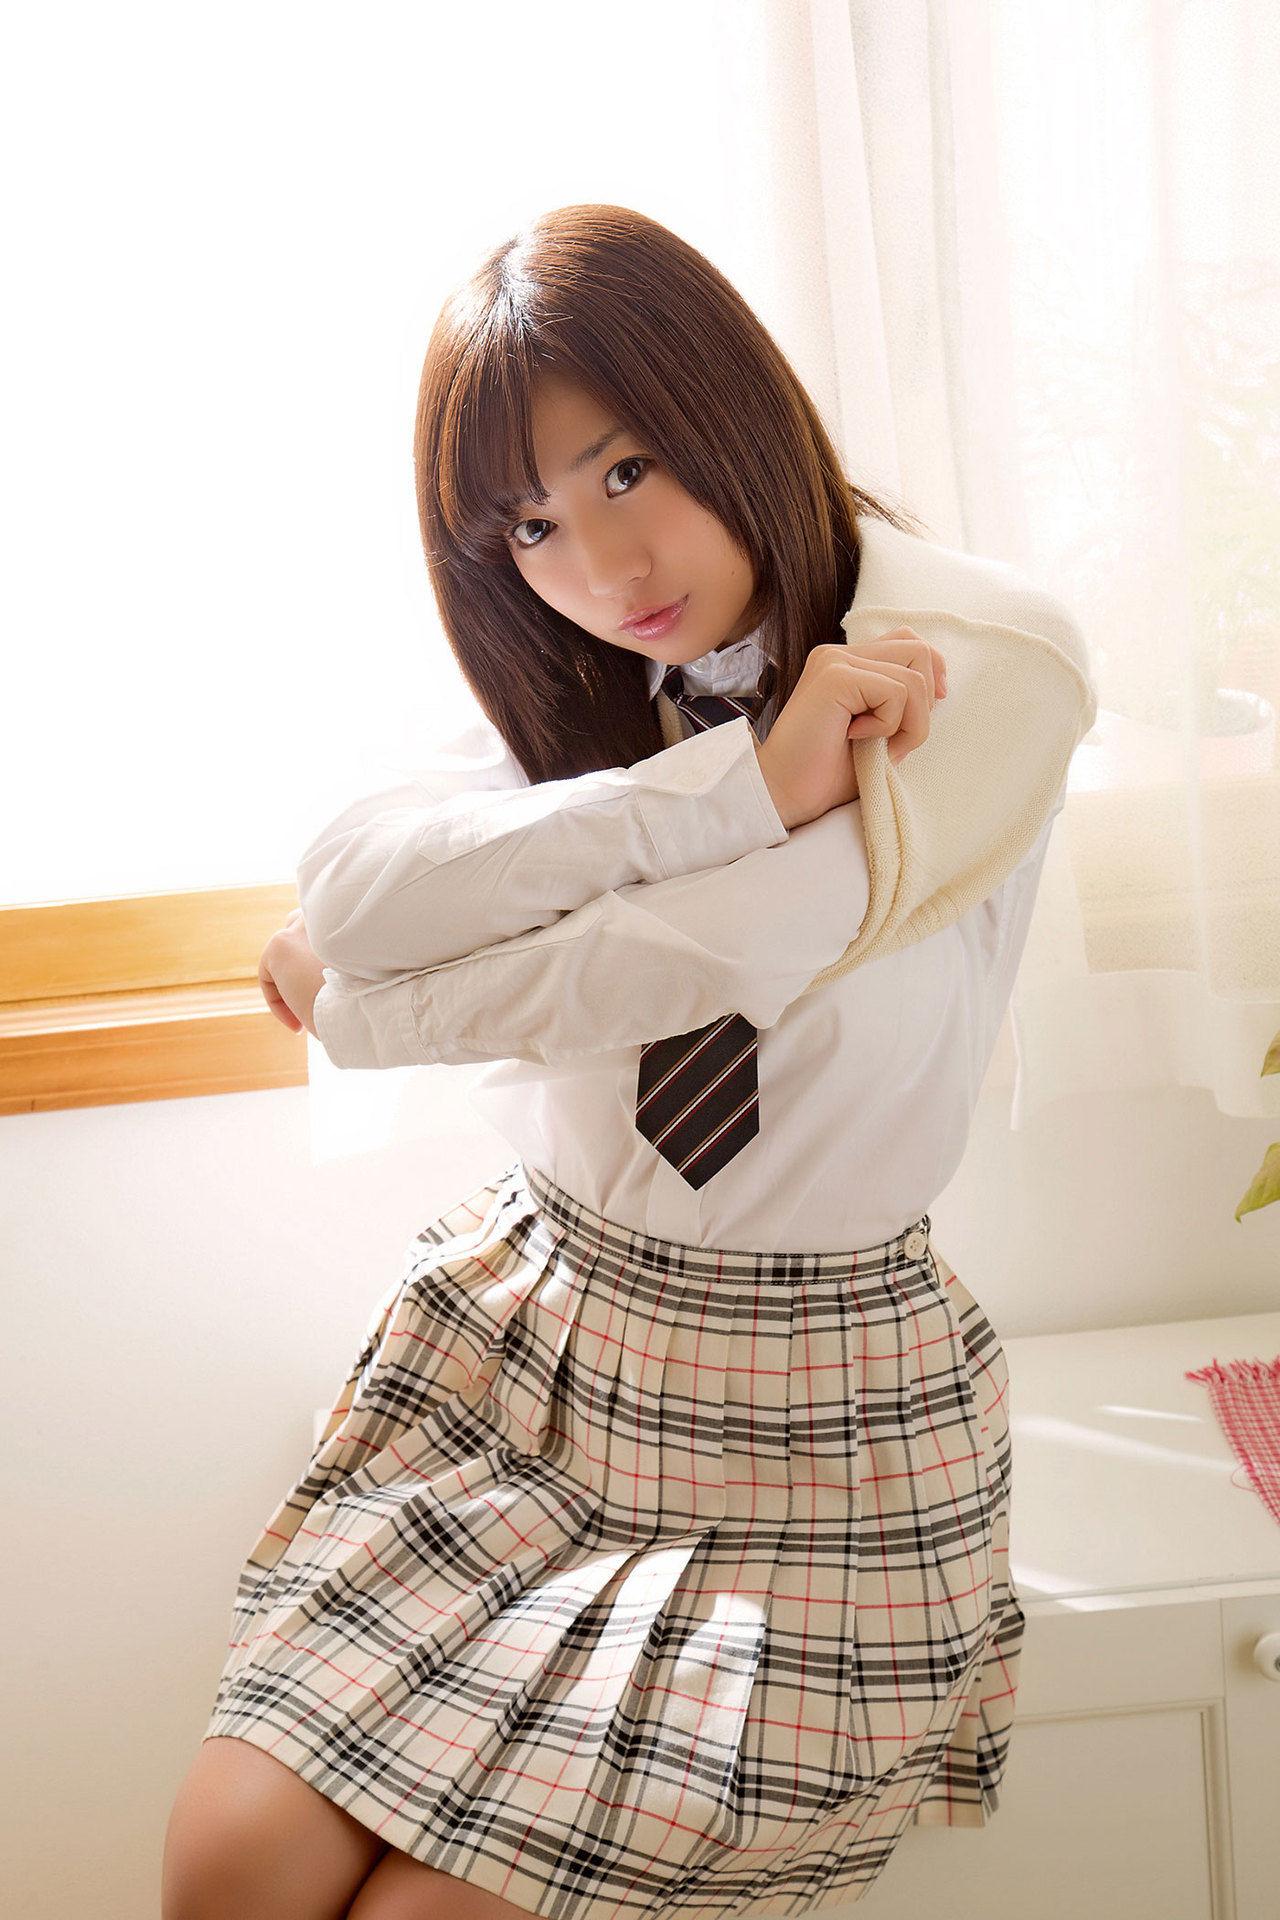 Onuki Ayaka Onuki takes off her school uniform and wears a white bikini005